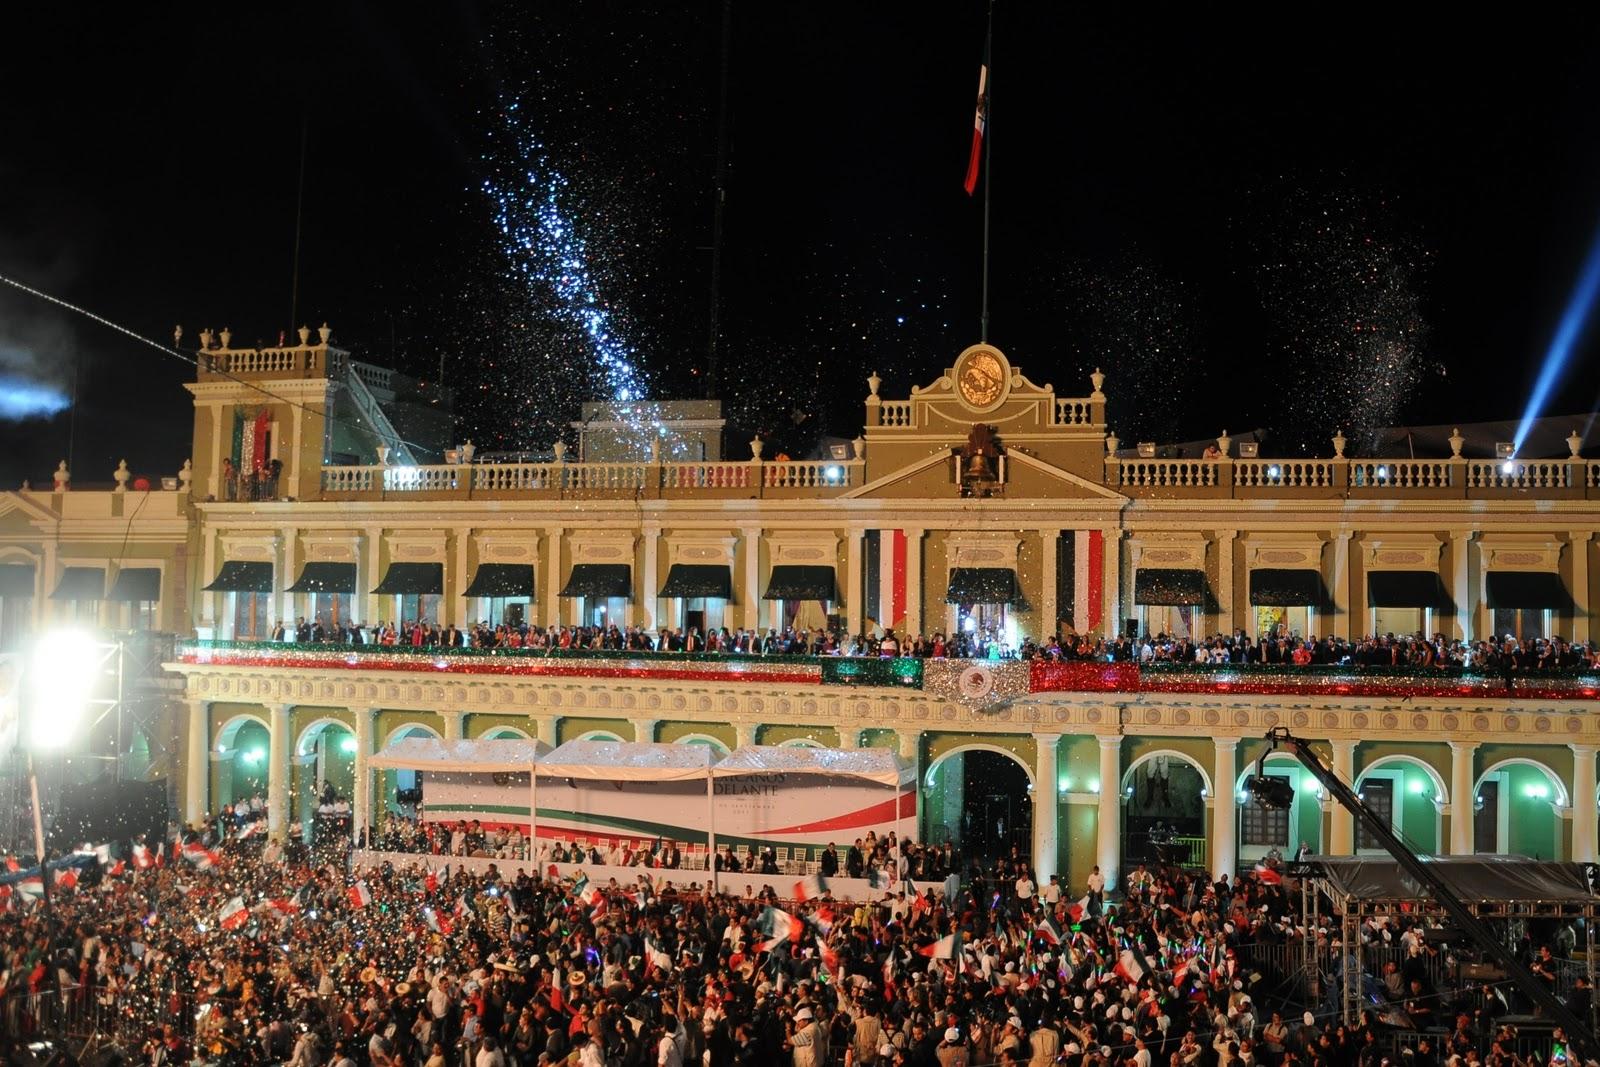 Encabeza javier duarte ceremonia por 201 aniversario del for Adolfo dominguez plaza americas xalapa